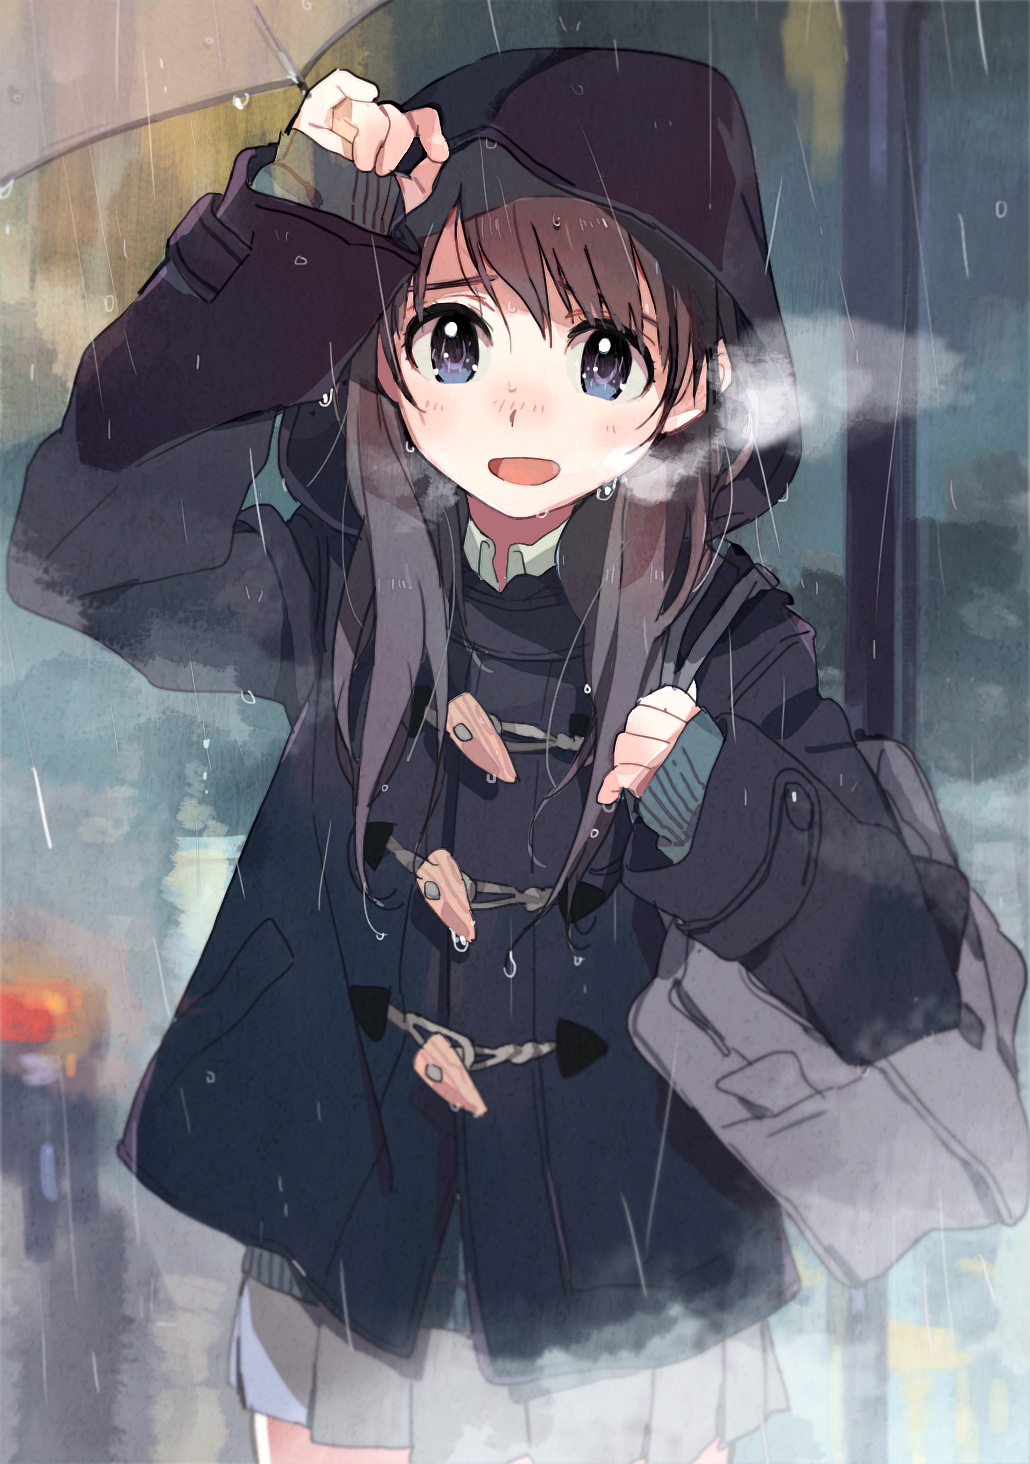 id=33811473,毛呢大衣美女,大约在冬季图片,卡通动漫图片